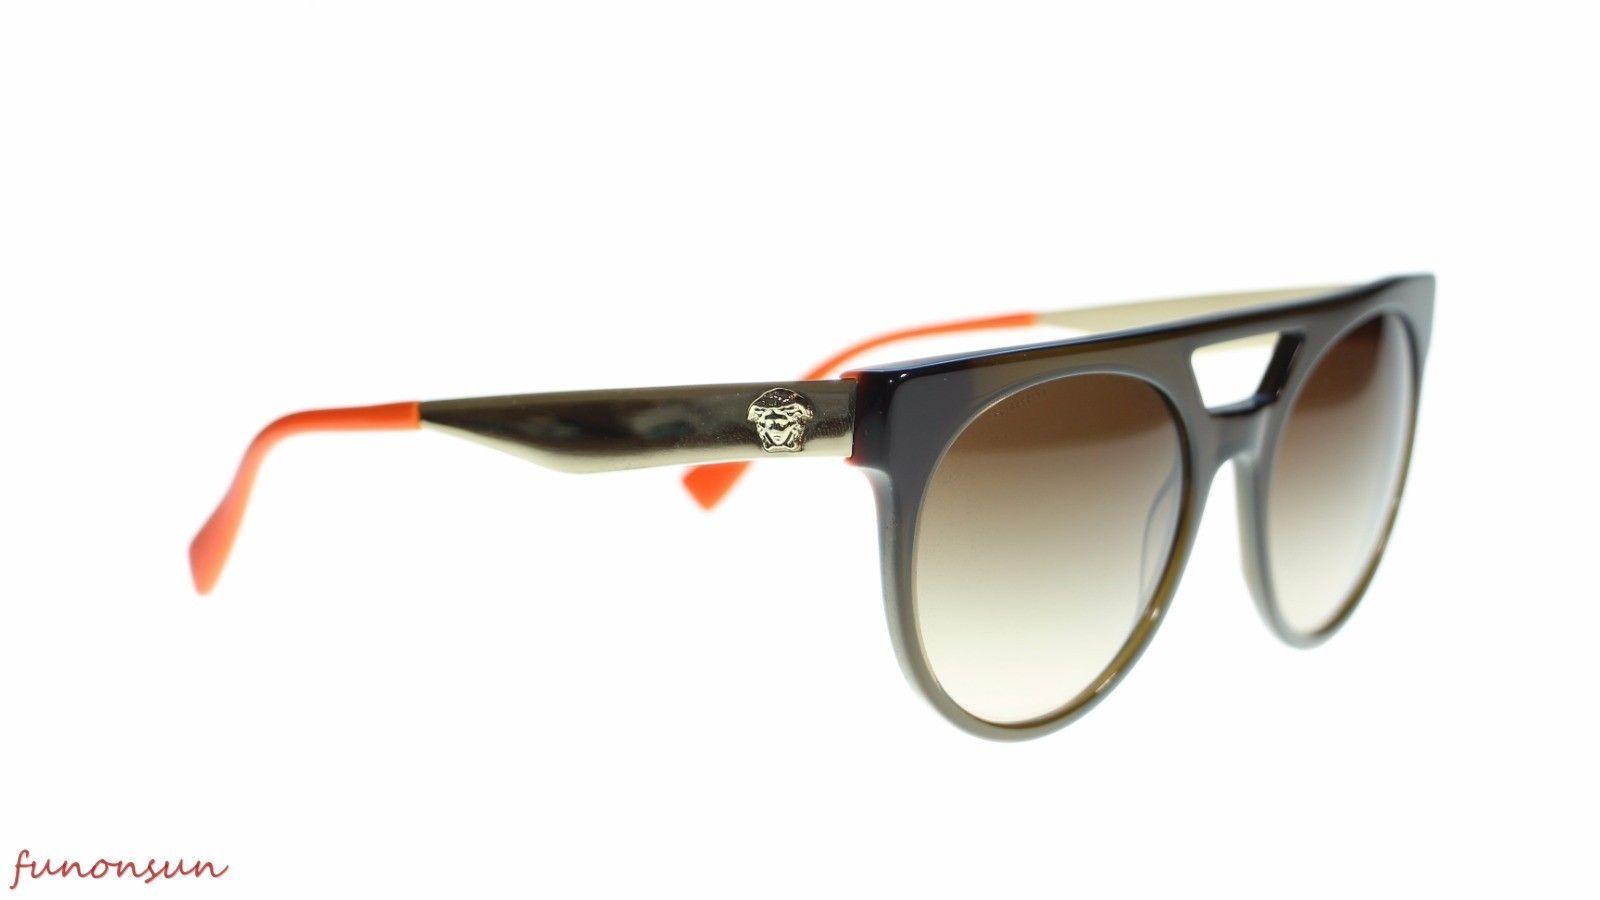 527d38312a2d Versace Men s Round Sunglasses VE4339 523513 Green Orange Brown  GradientLens 55m